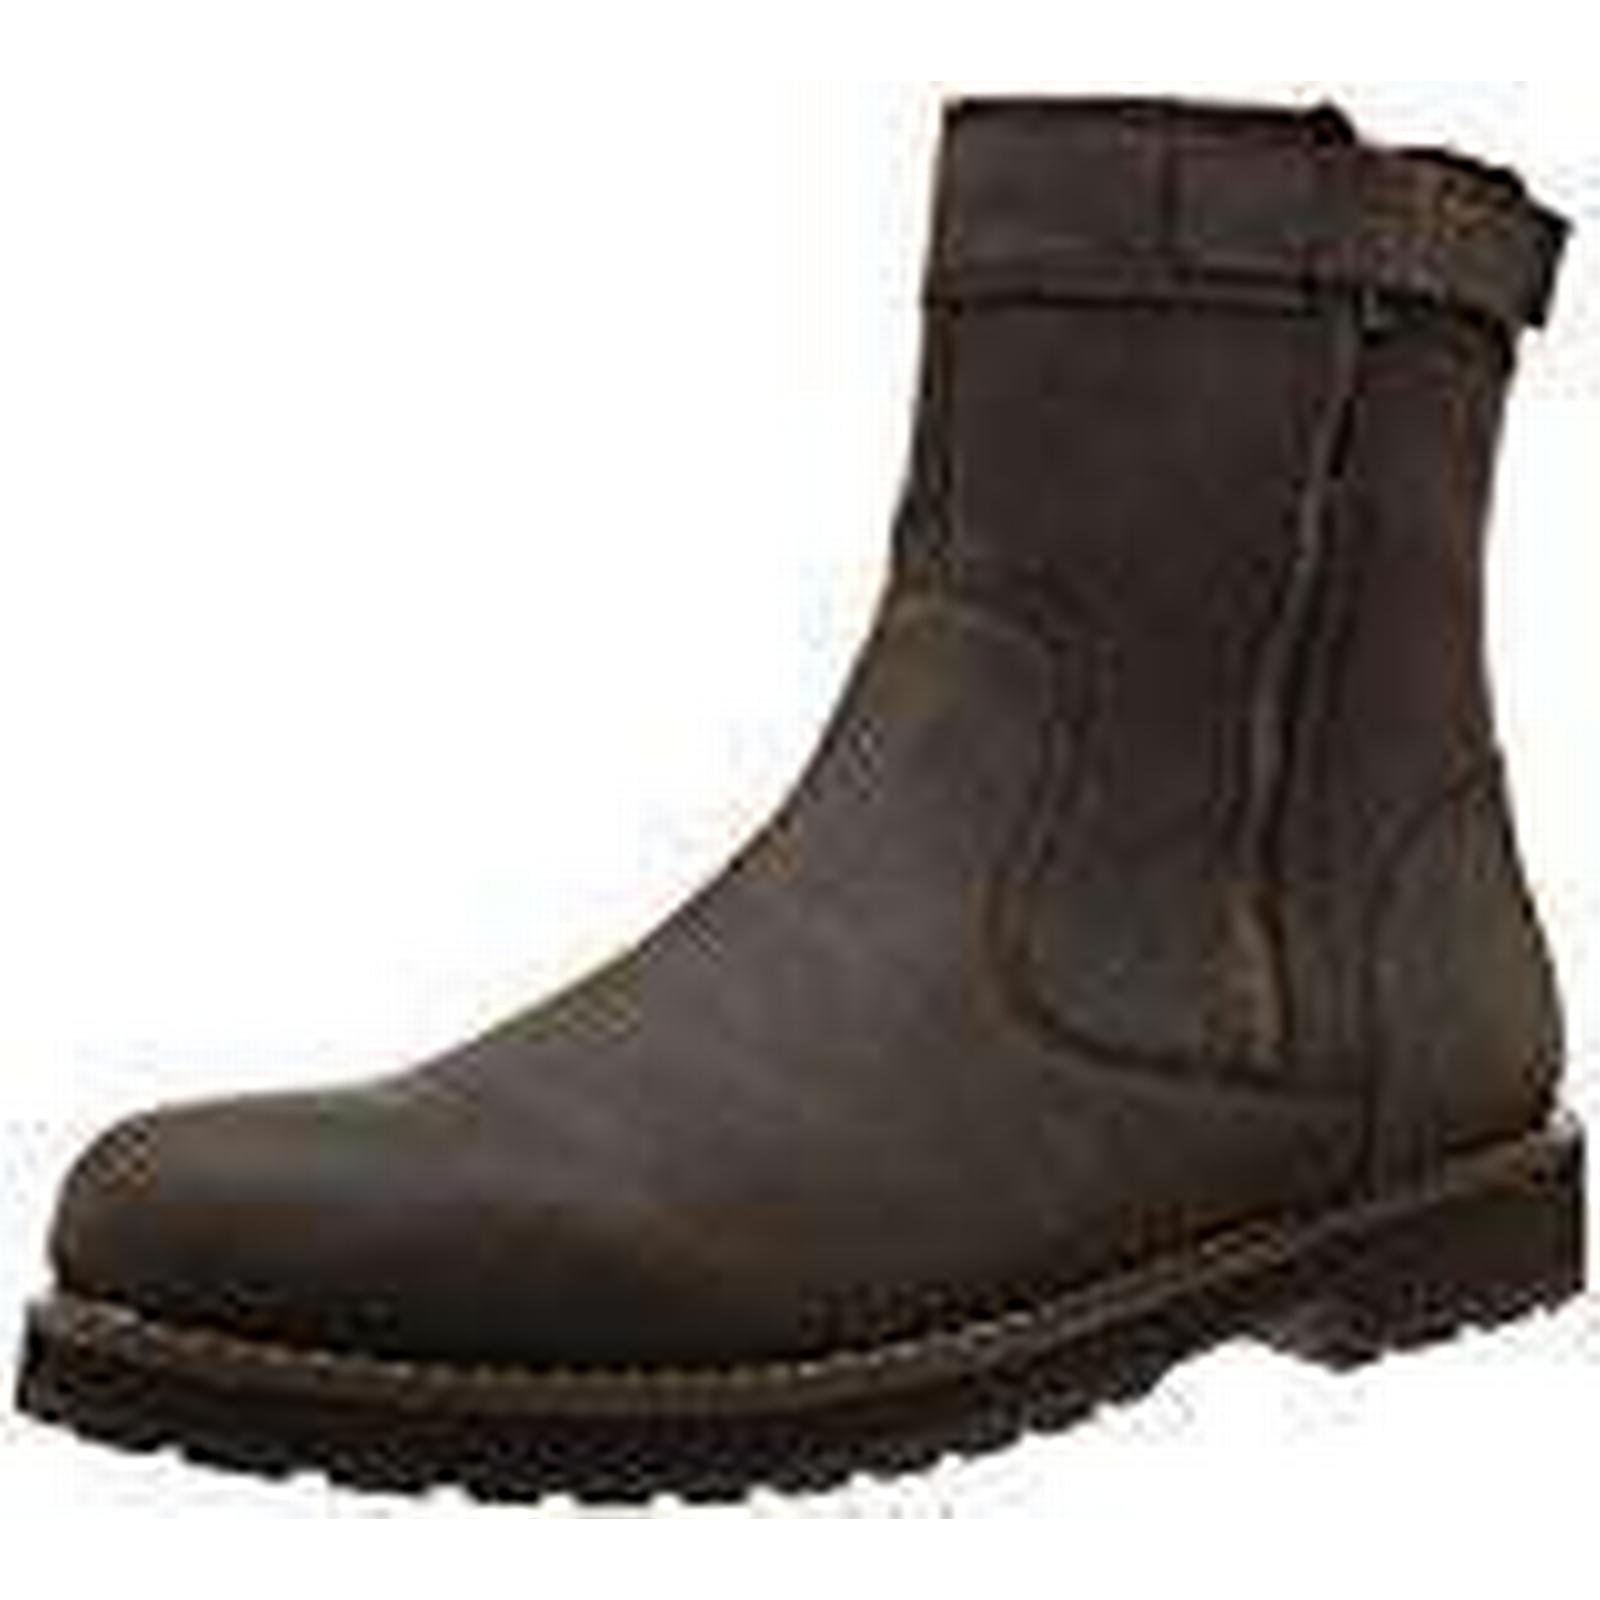 TBS Quamer, Mens 11 Biker Boots, Brown (Ebene), 11 Mens UK (45 EU) 88099a